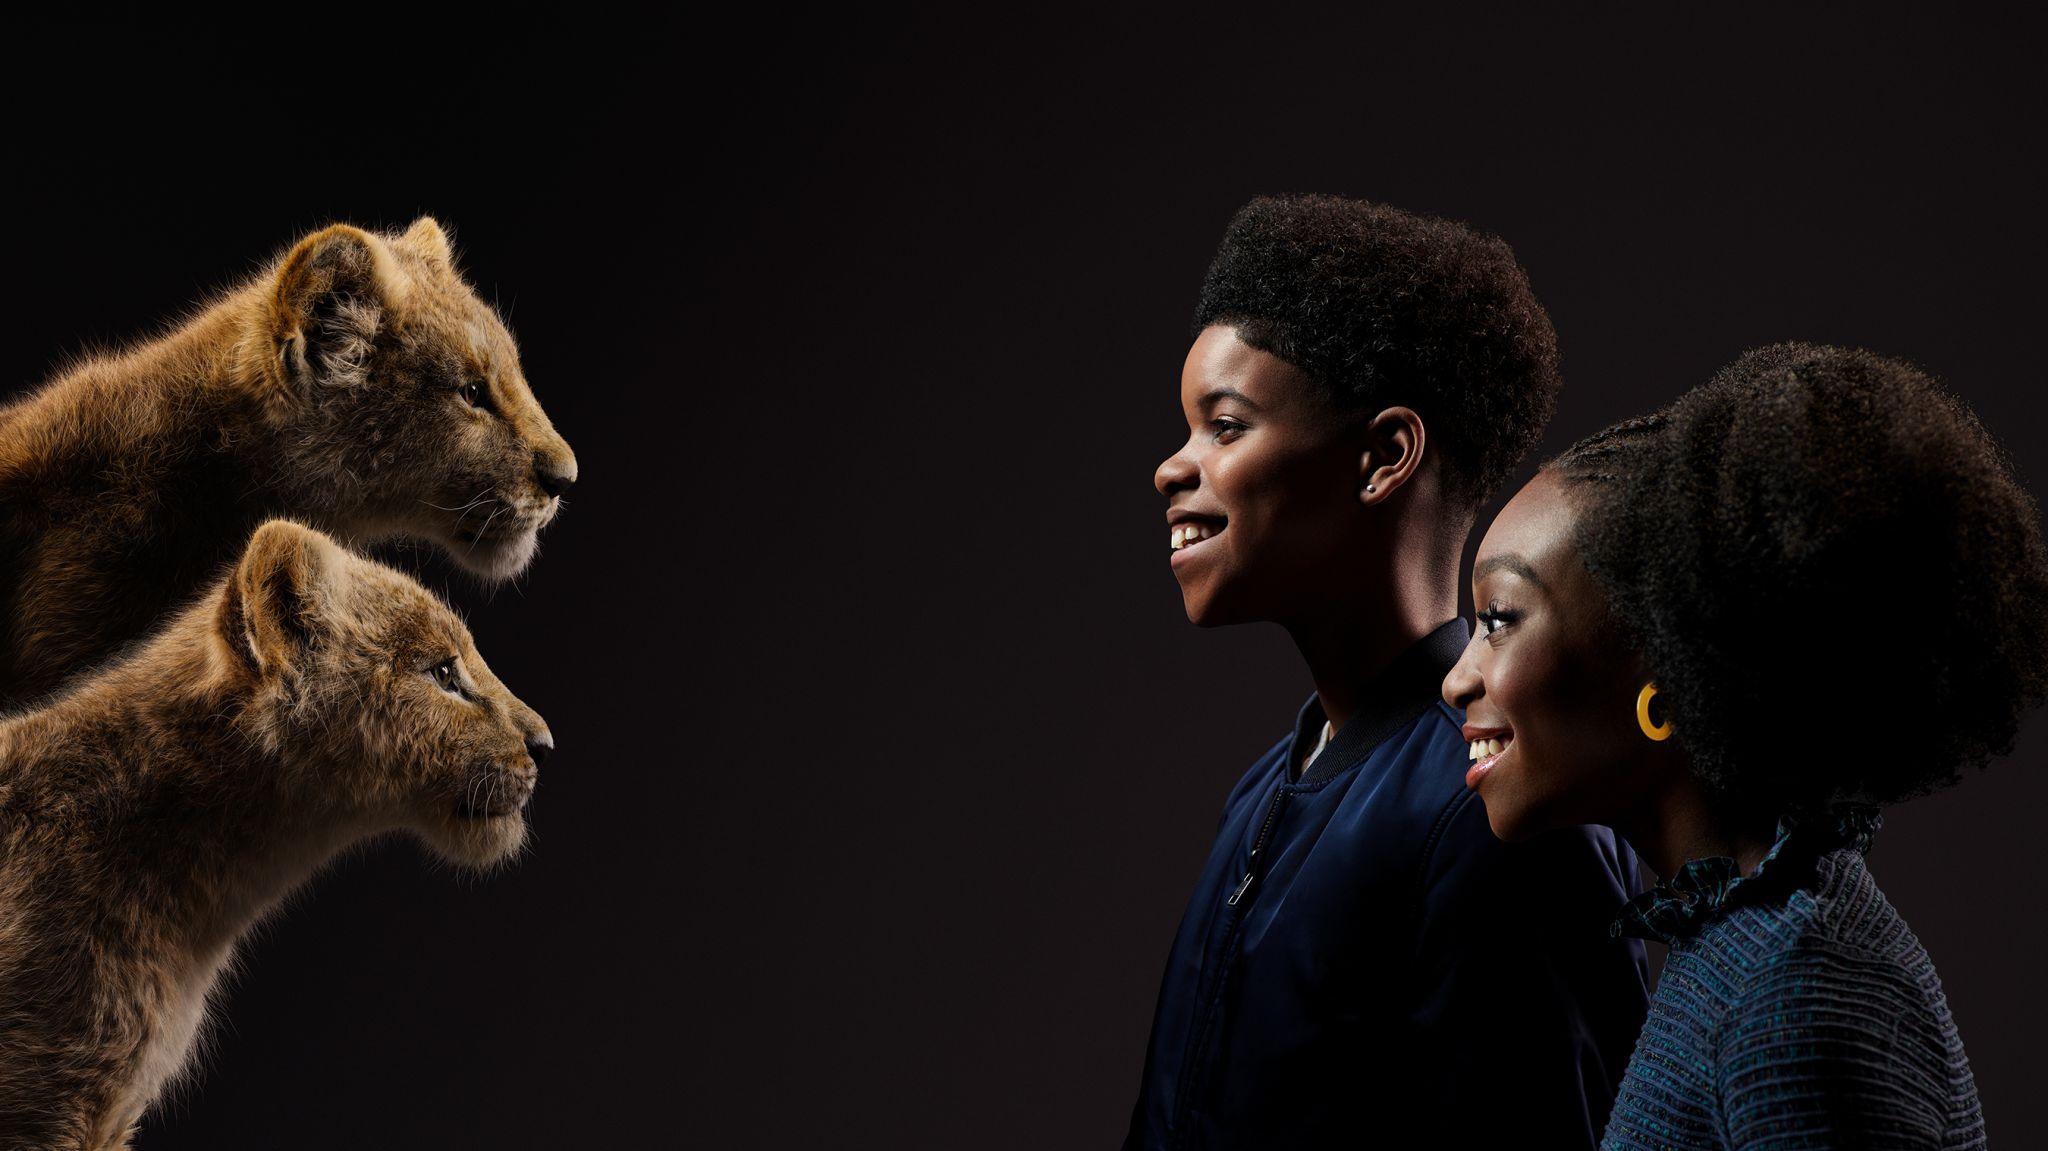 lion king cast 1994 simba singing voice